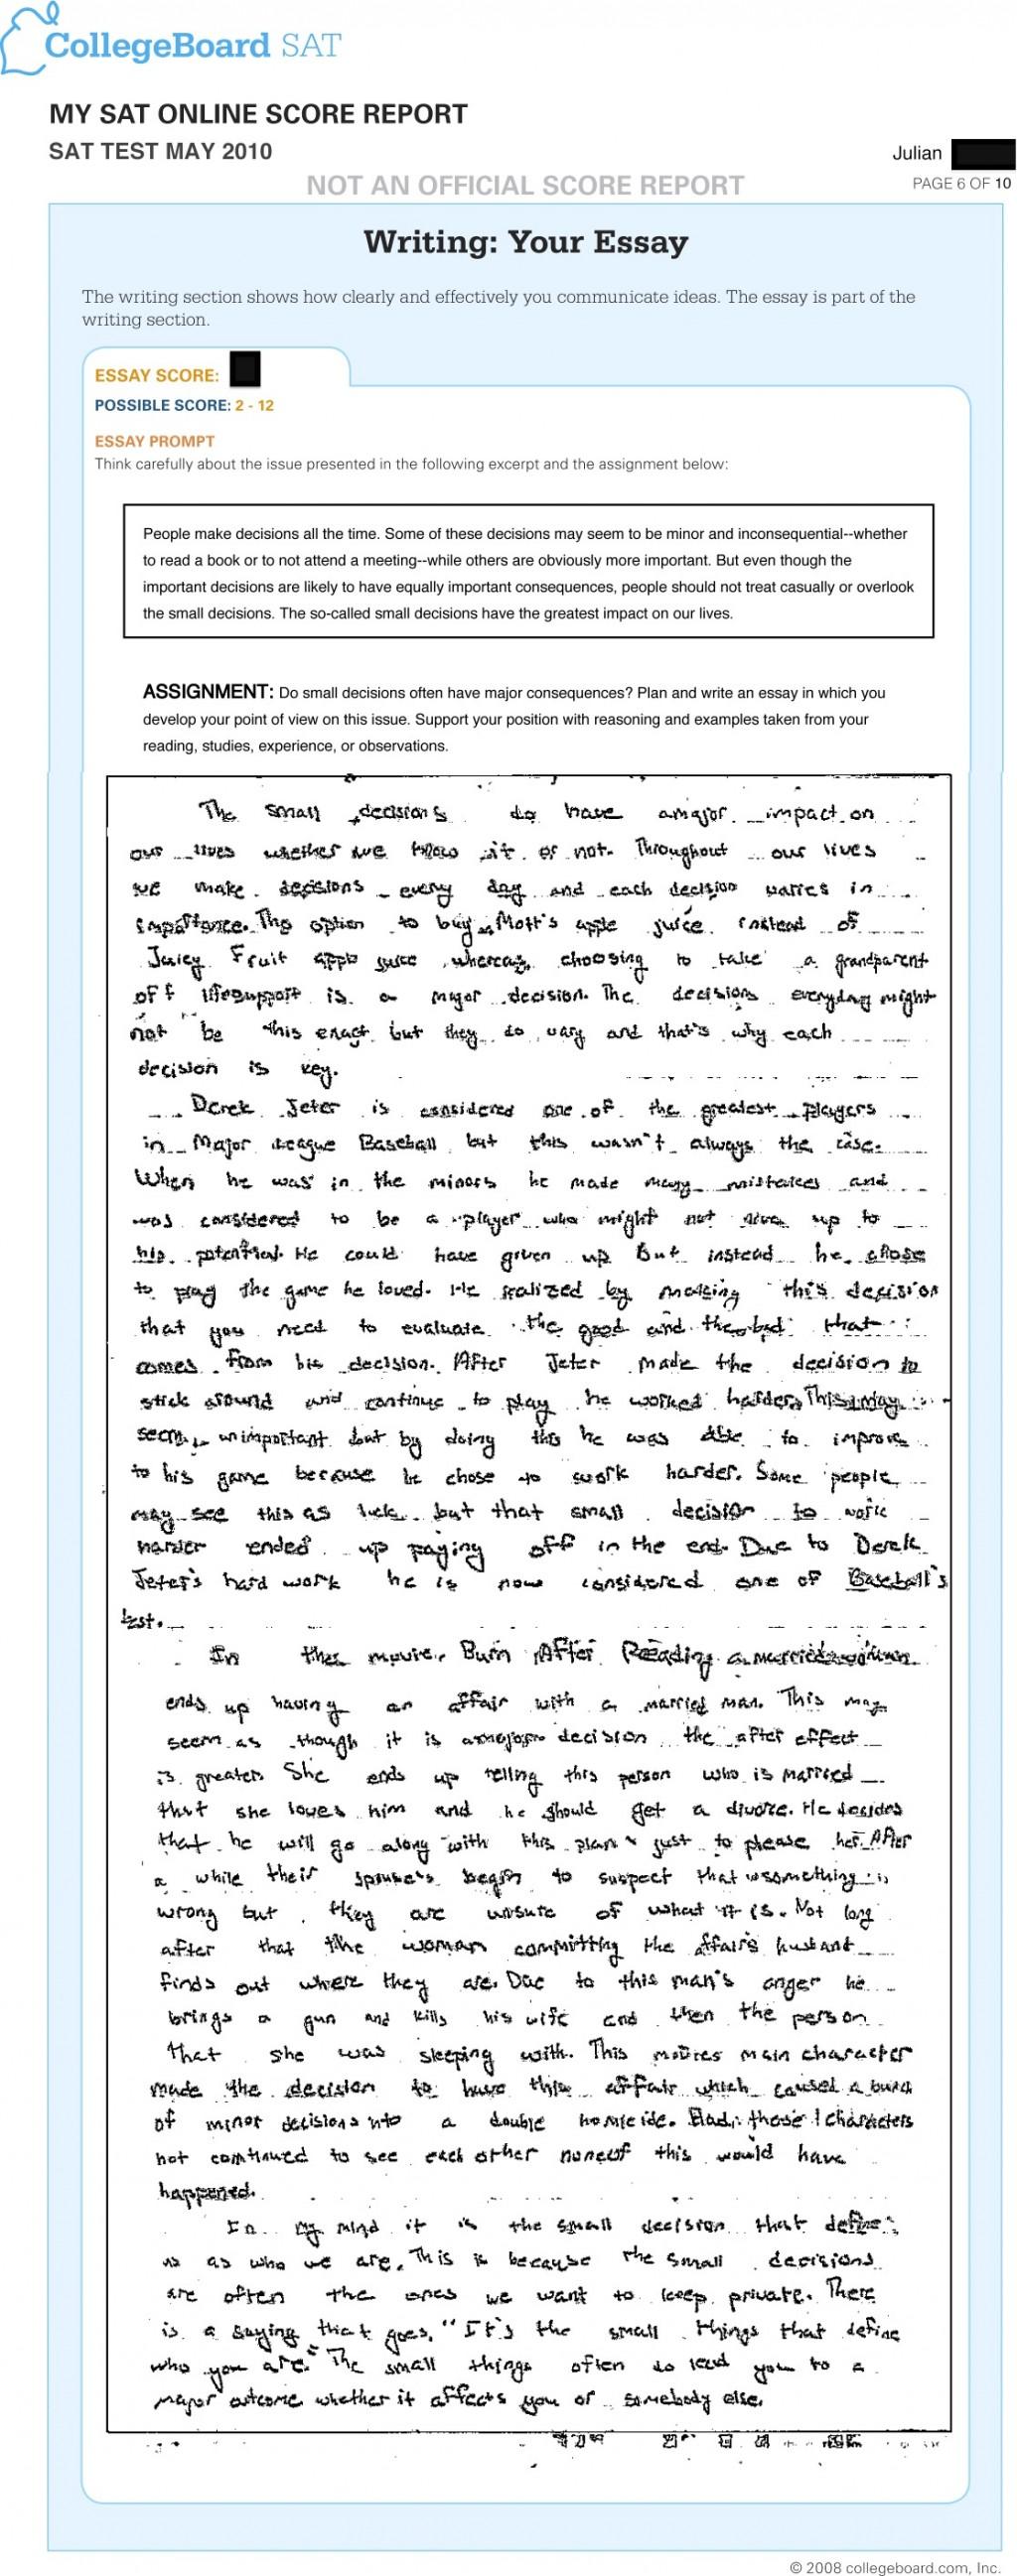 001 Jr May Sat Essay Time Dreaded Limit Breakdown Large